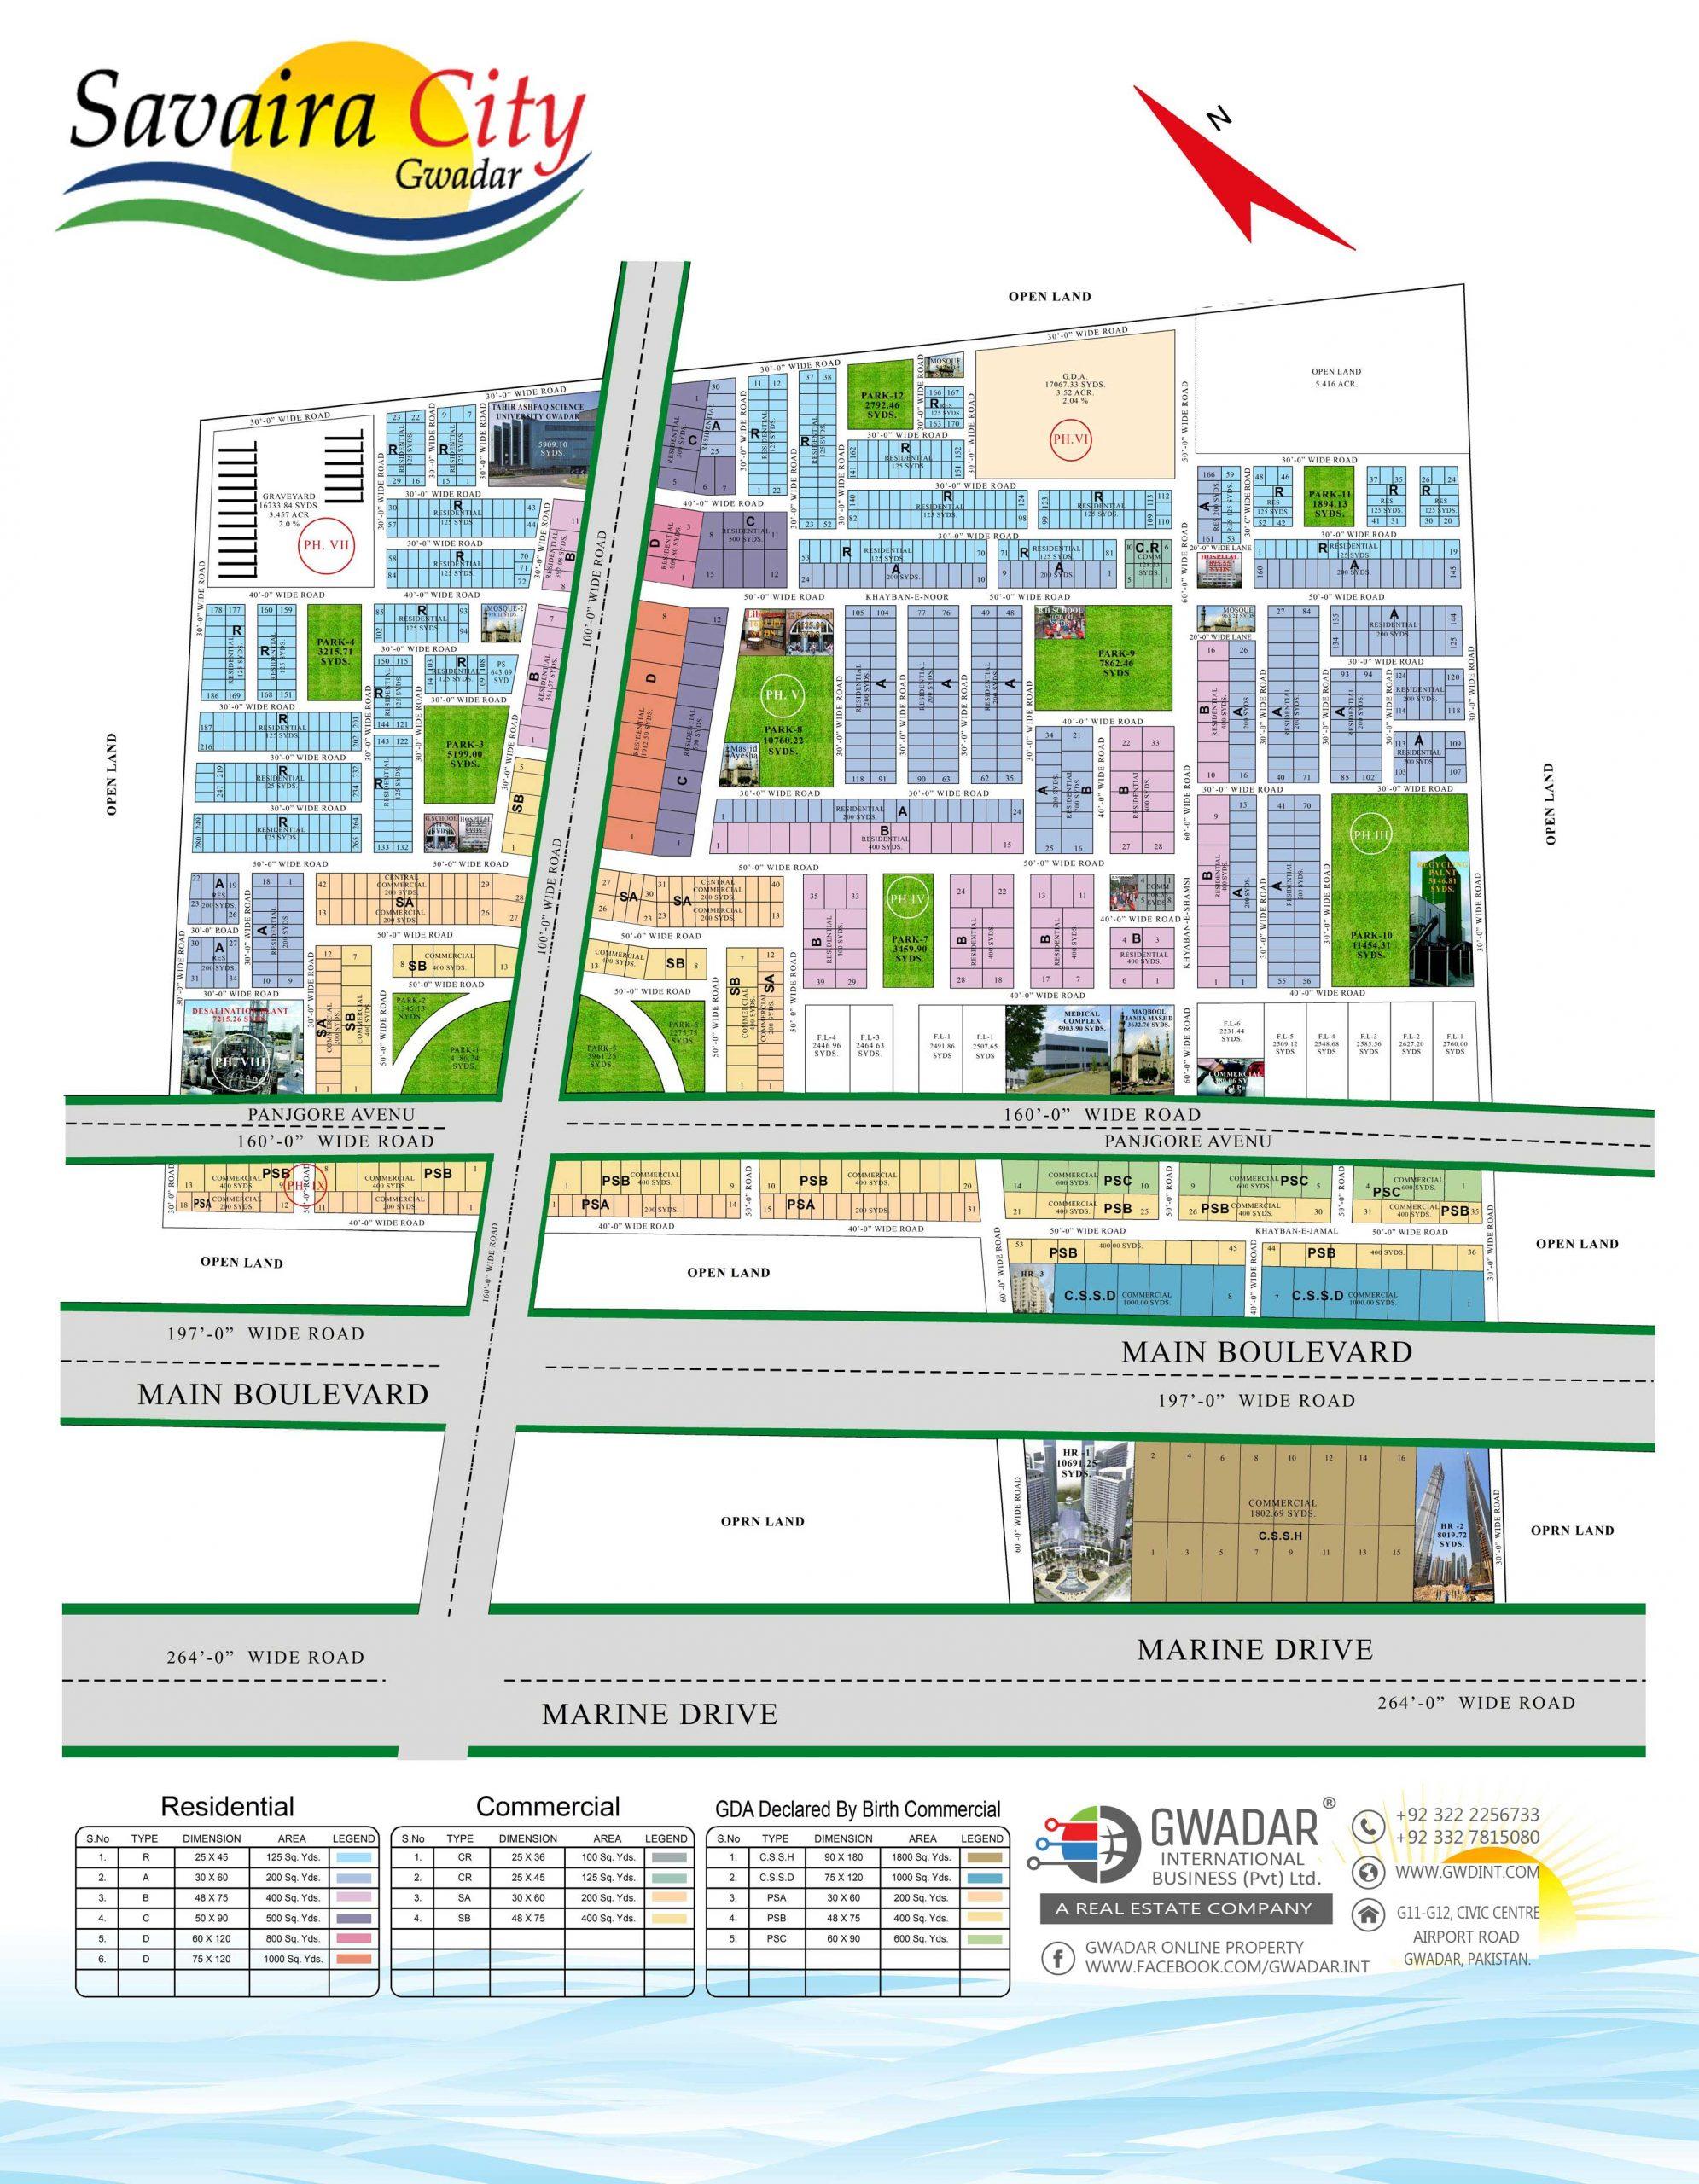 Savaira city Gwadar, Investment in Gwadar, Gwadar property rates